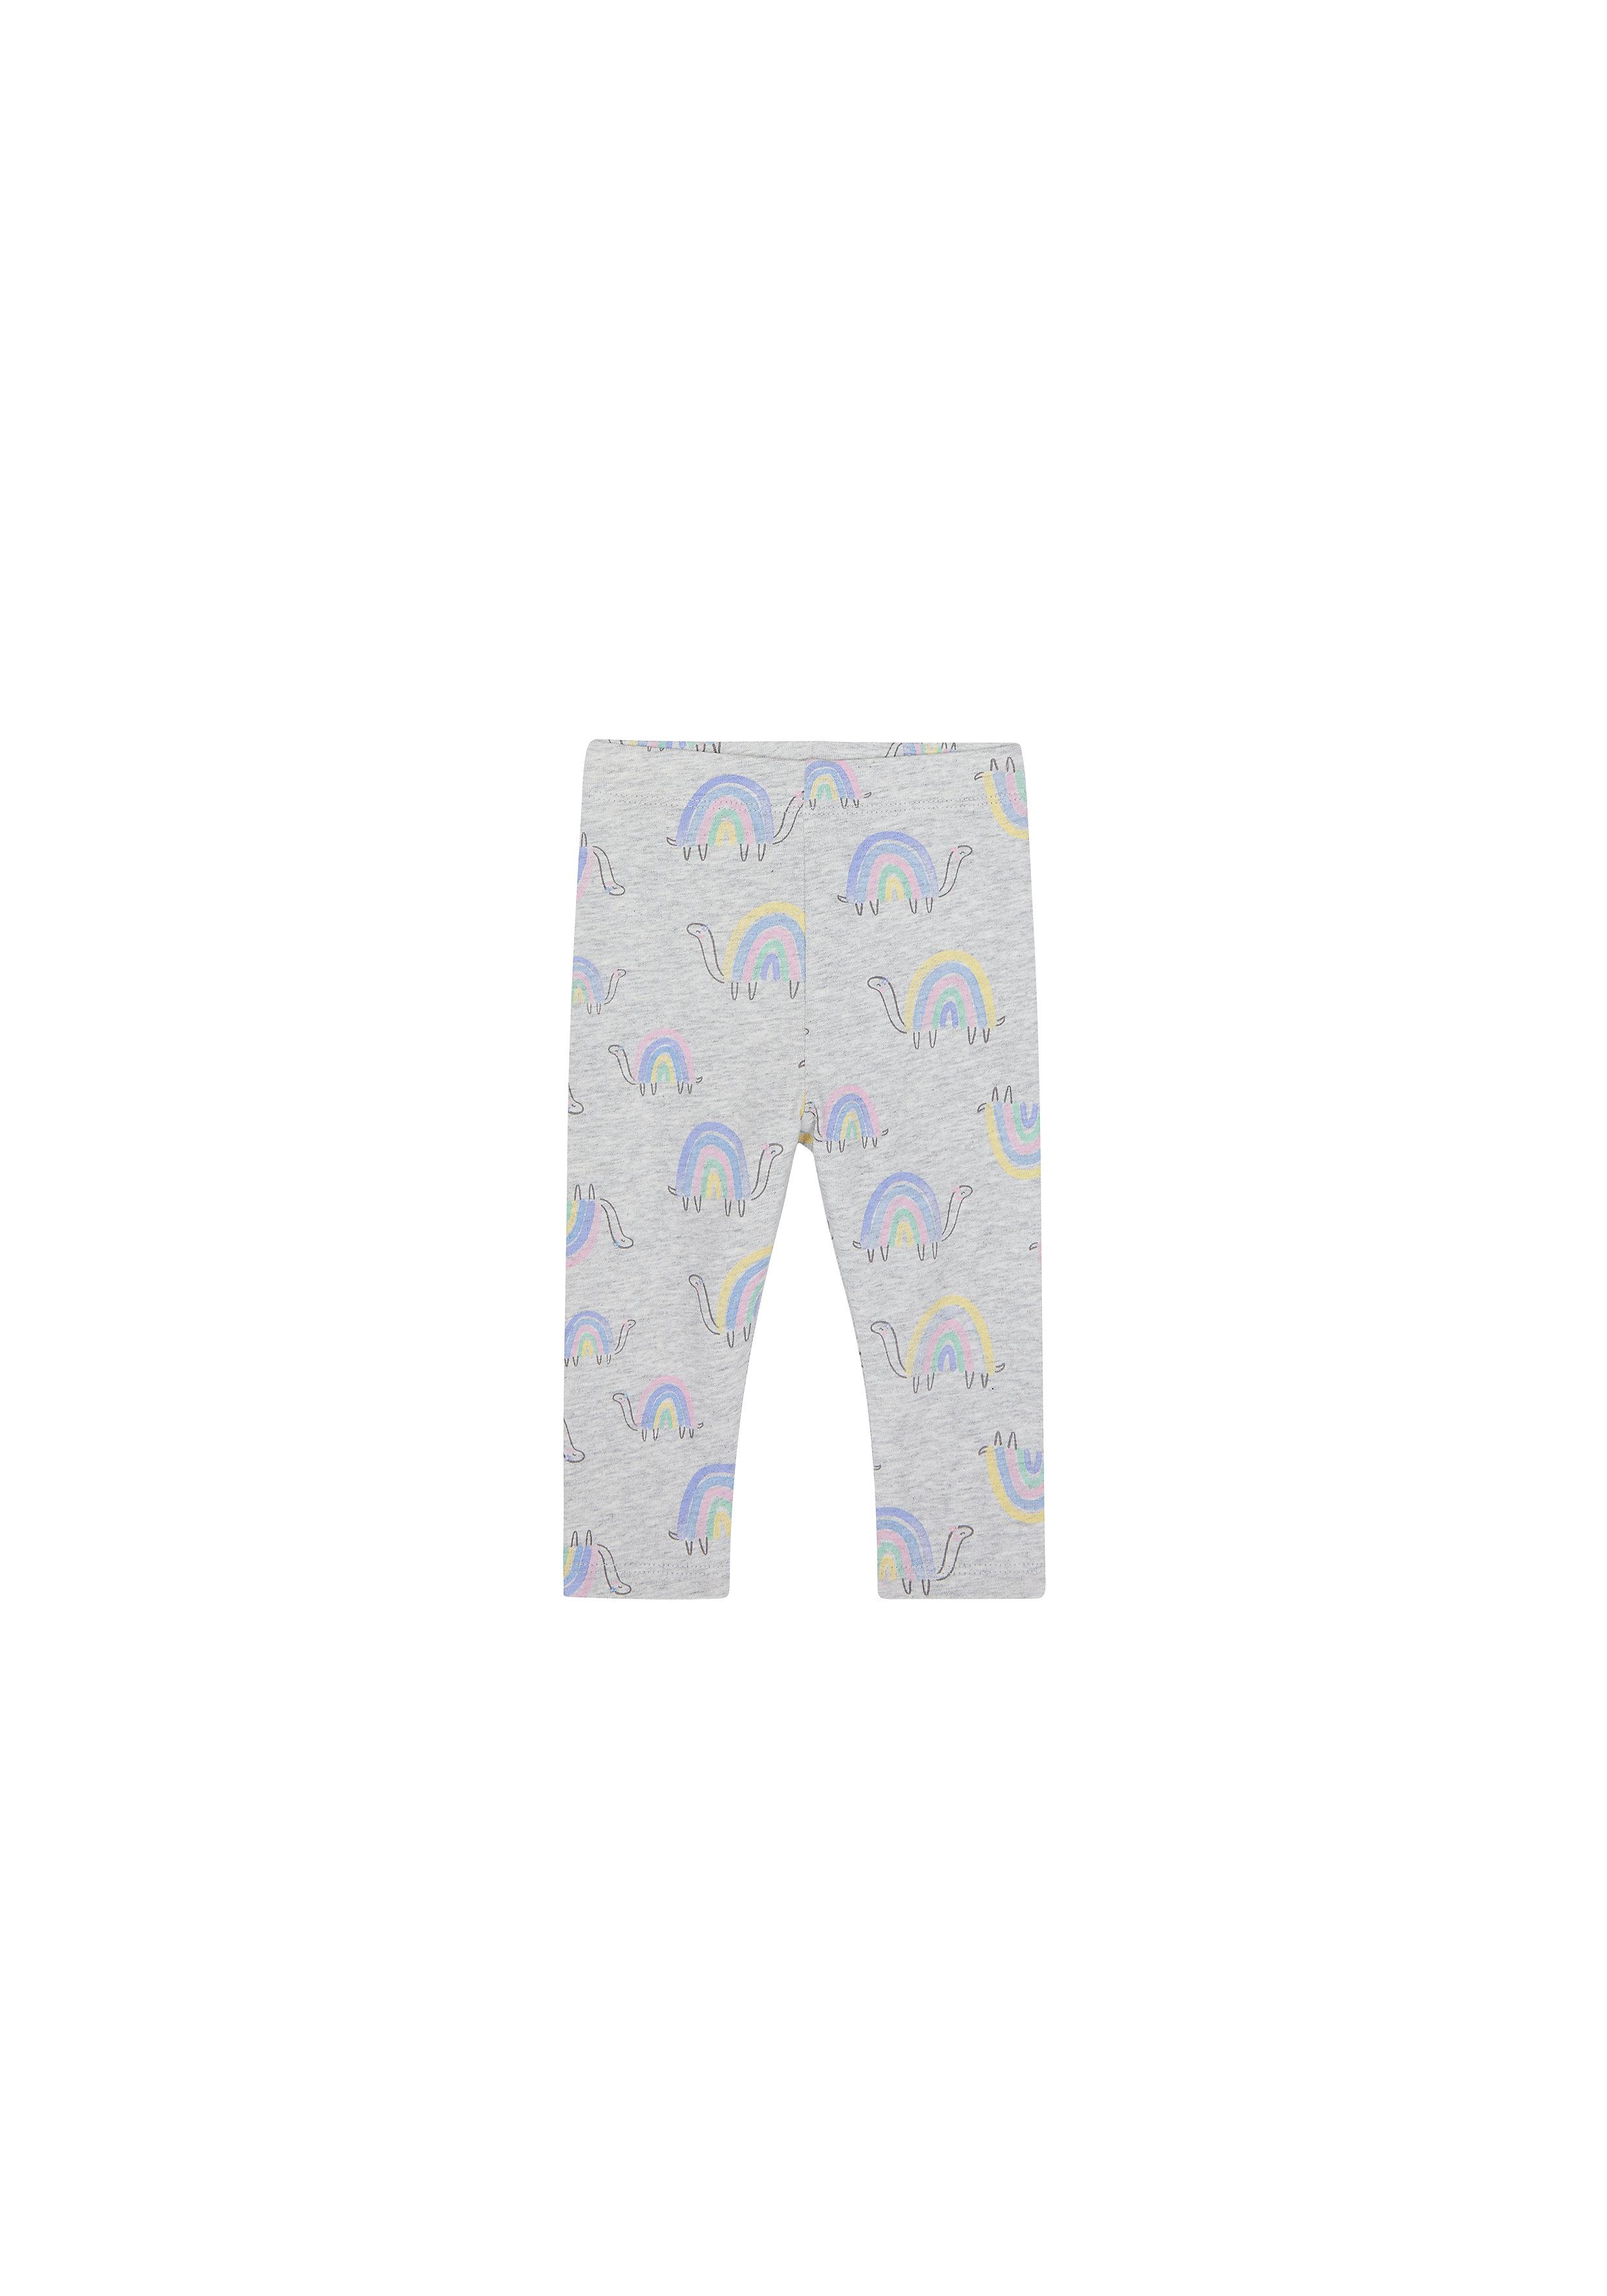 Mothercare | Girls Leggings Rainbow Print - Grey